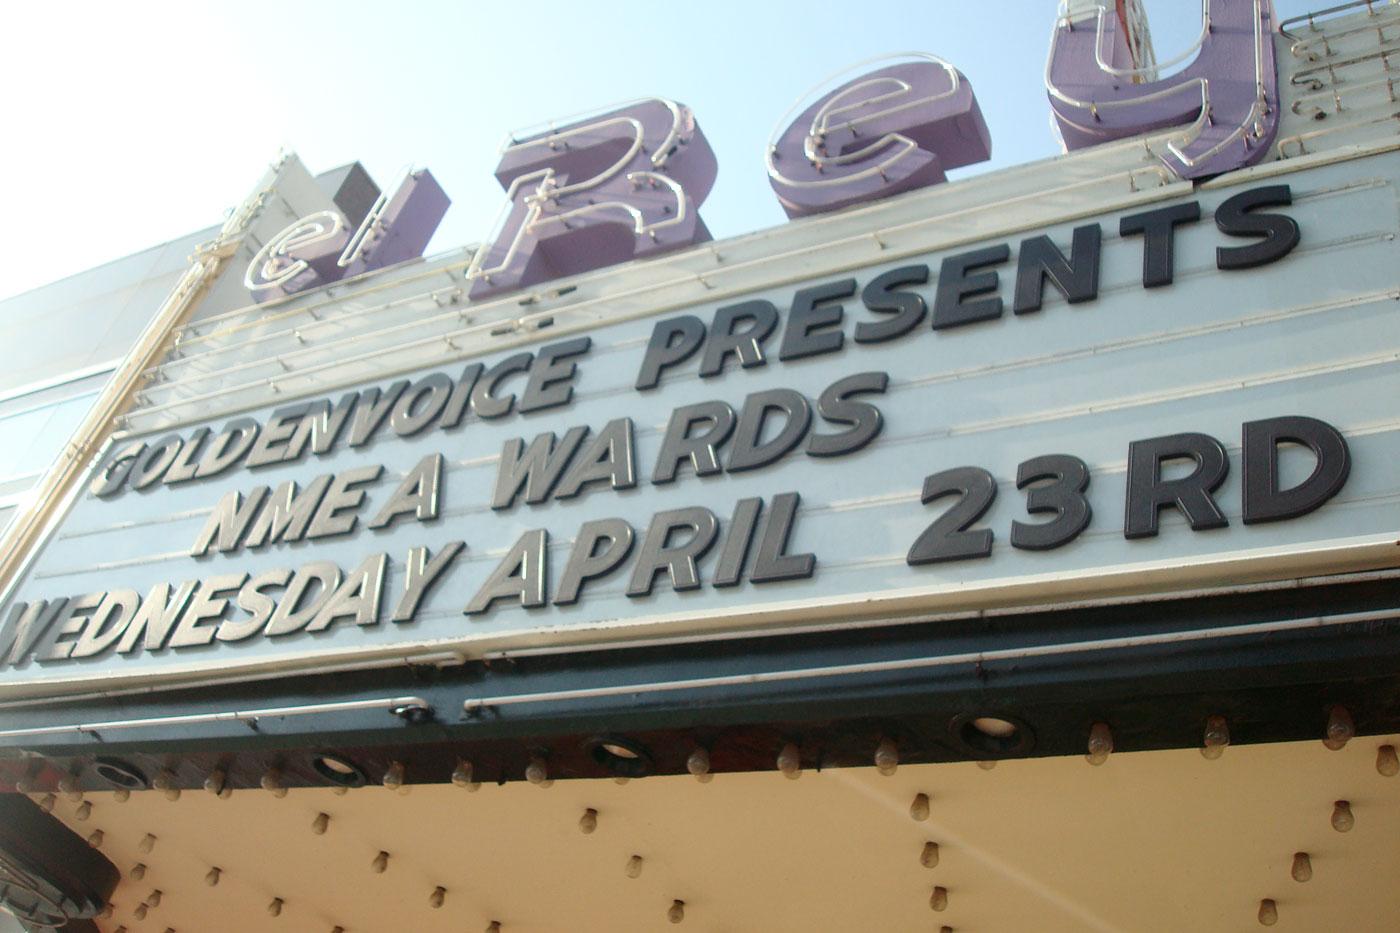 April 23, 2008